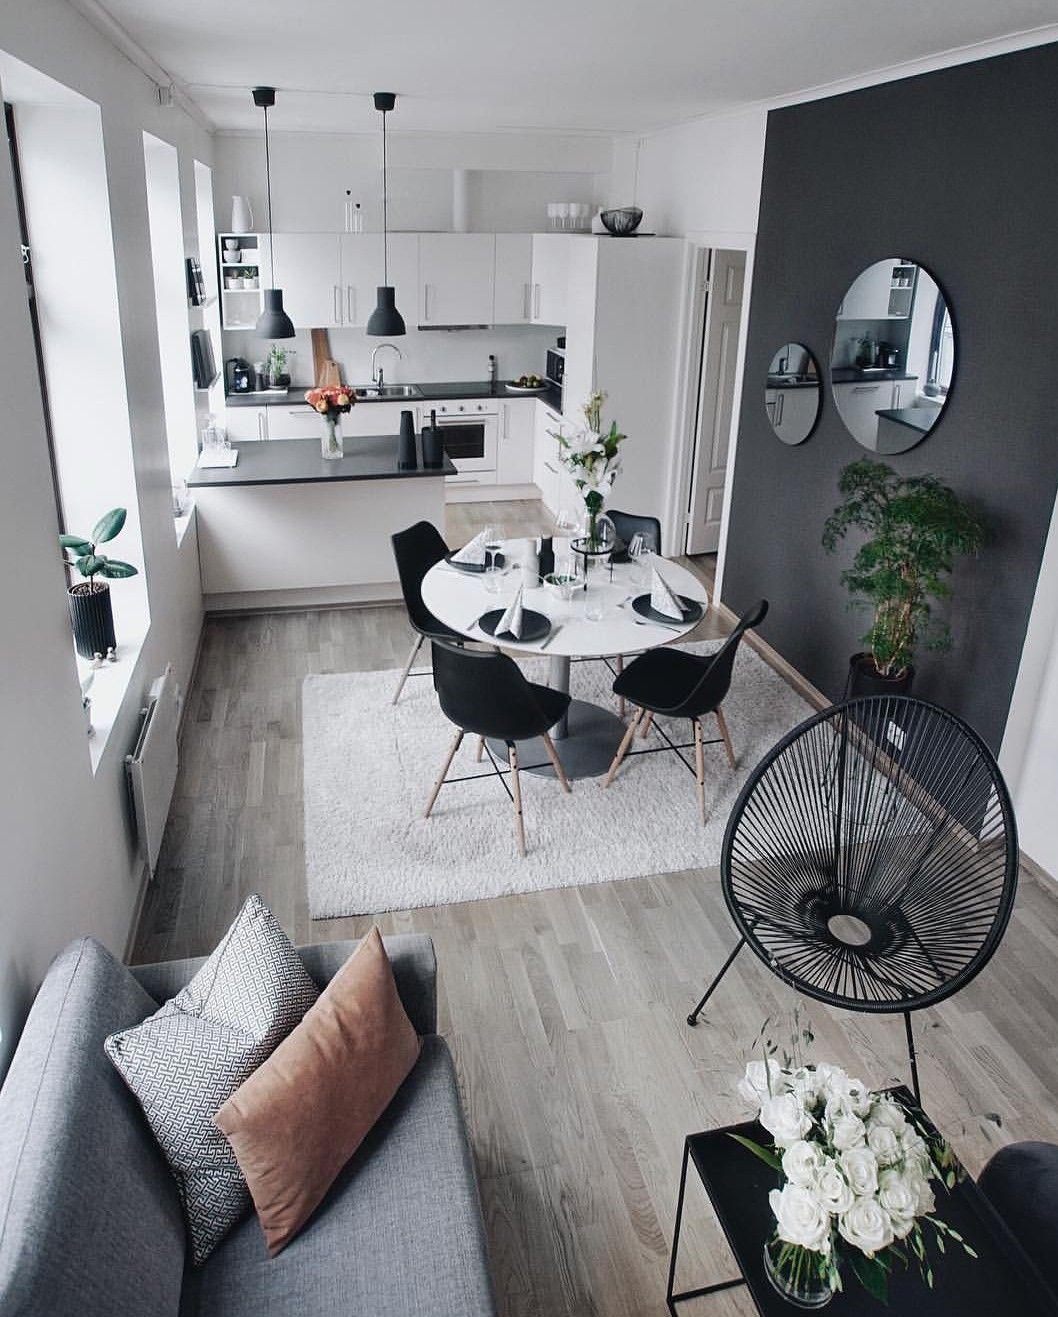 Pin By Liran Ben Hamo On Home Decor Room Minimalist